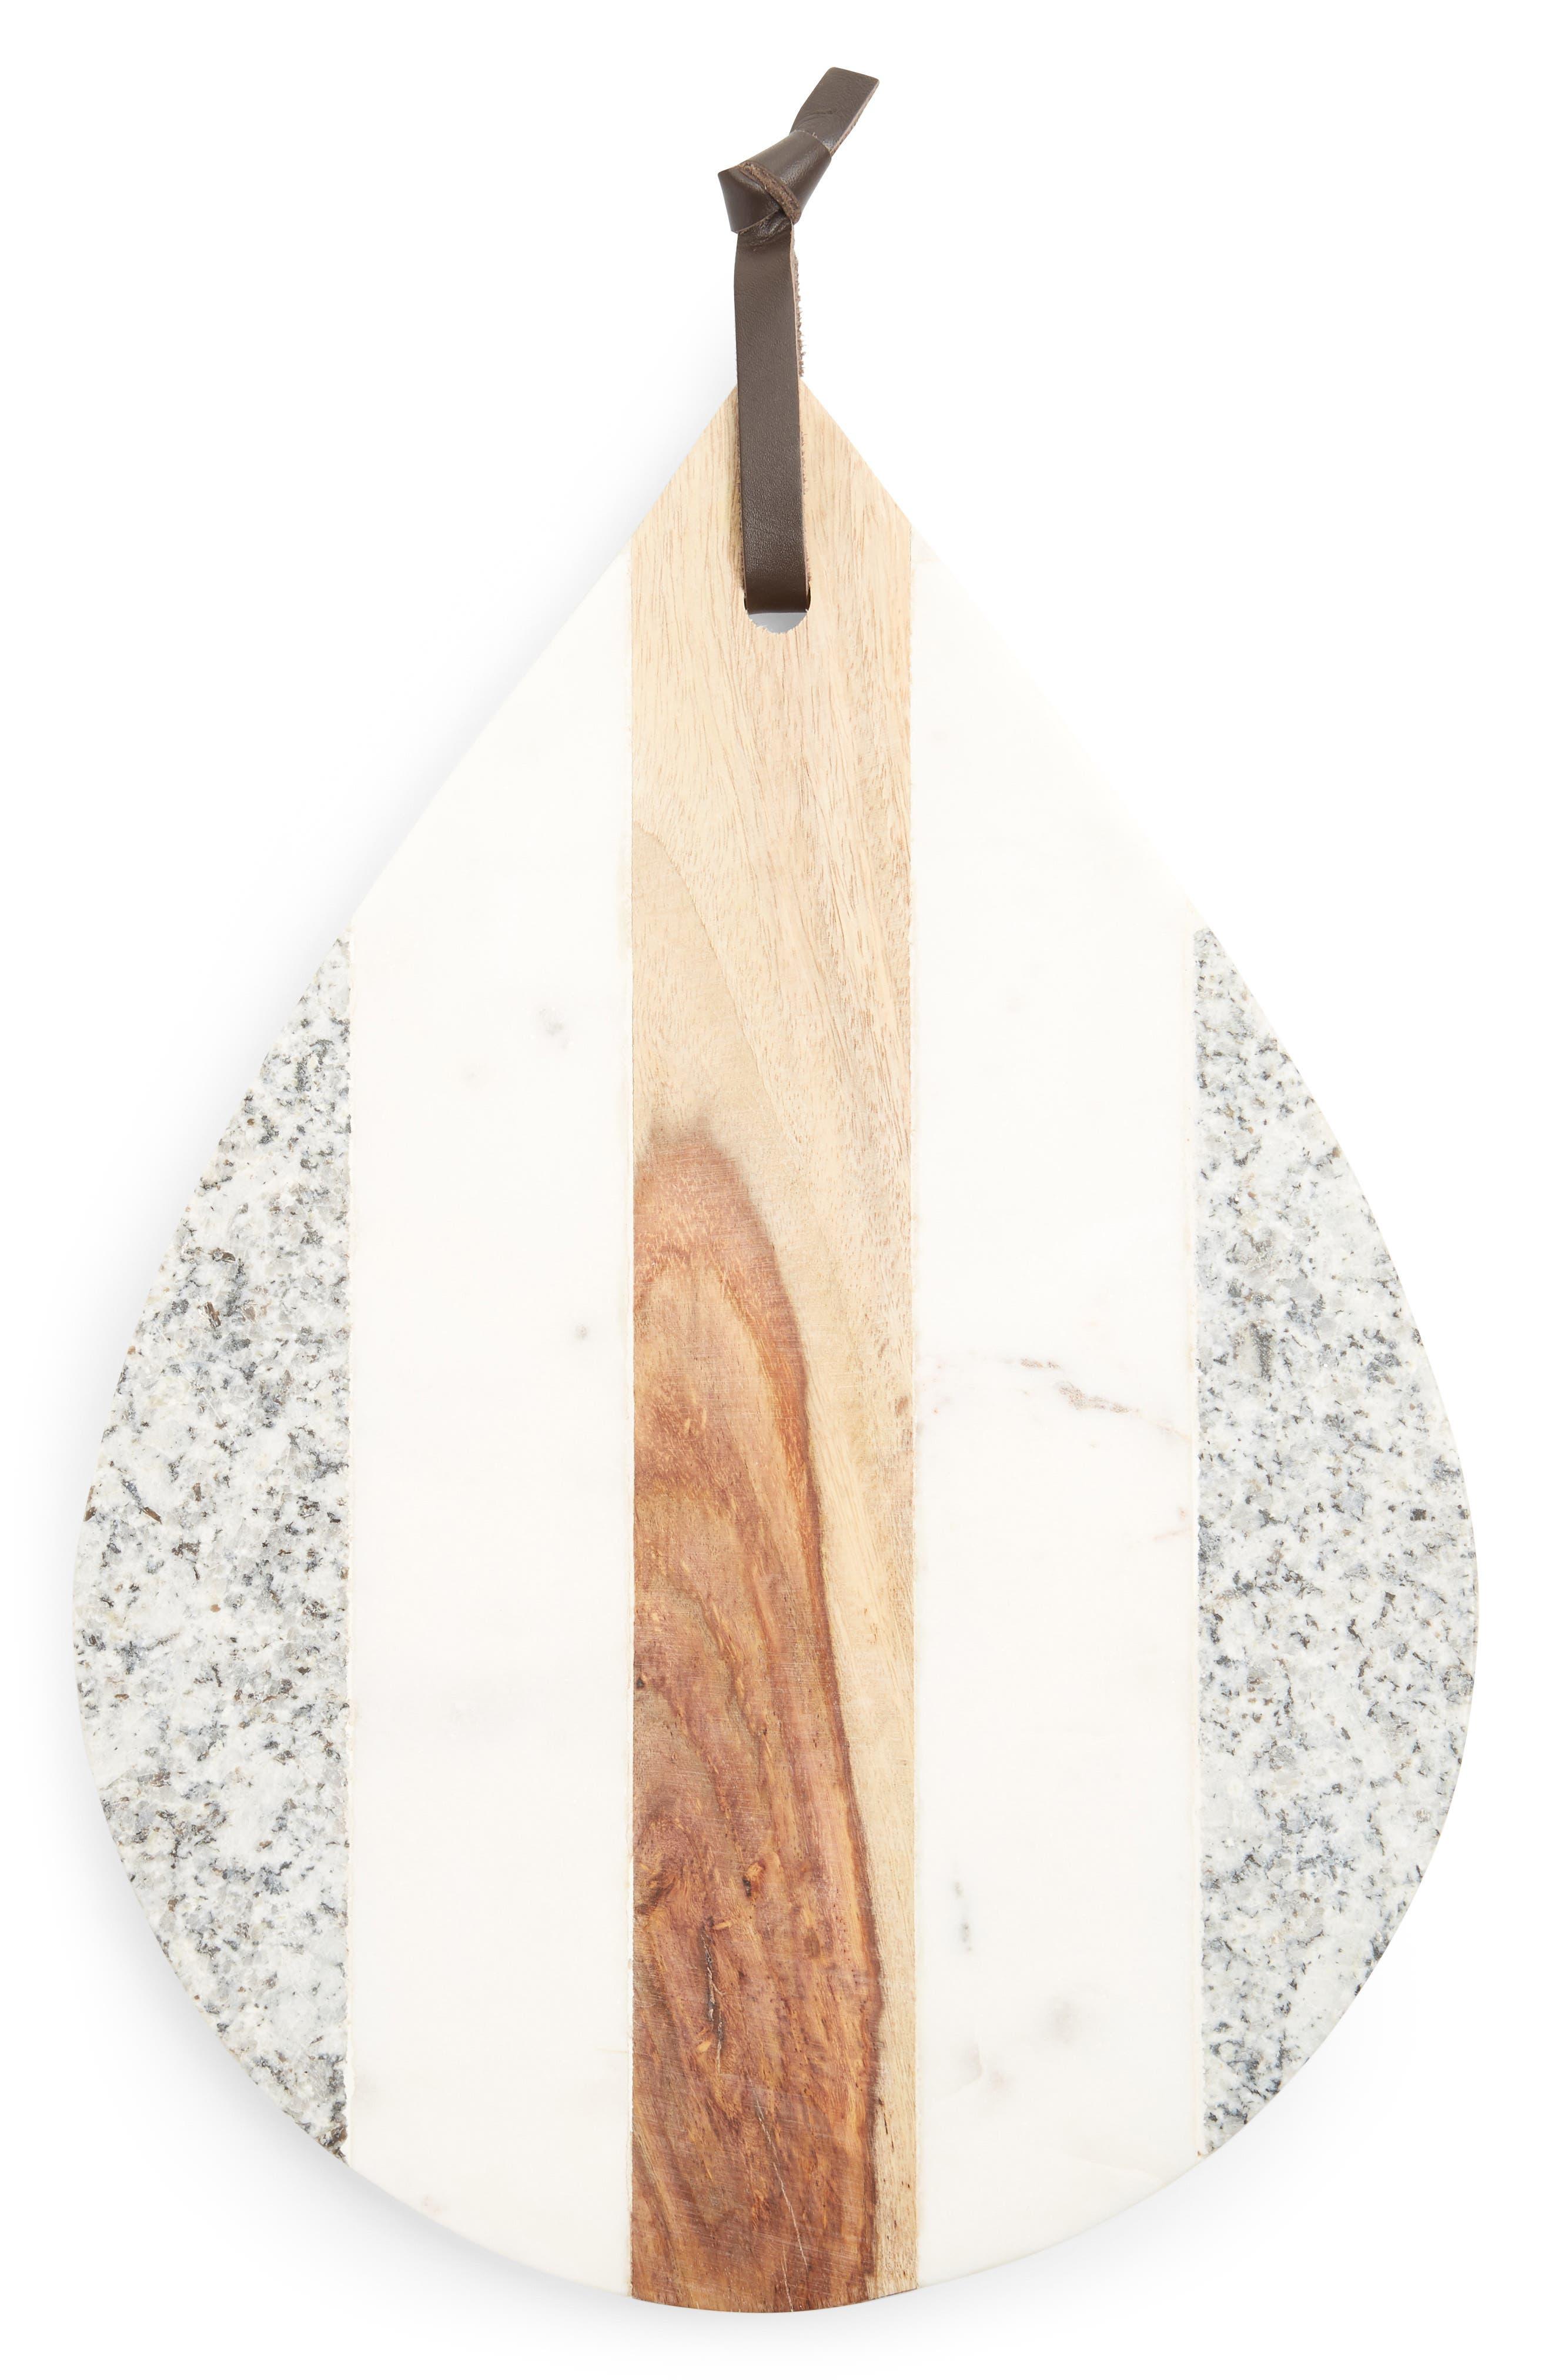 Teardrop Cutting Board,                         Main,                         color, GREY